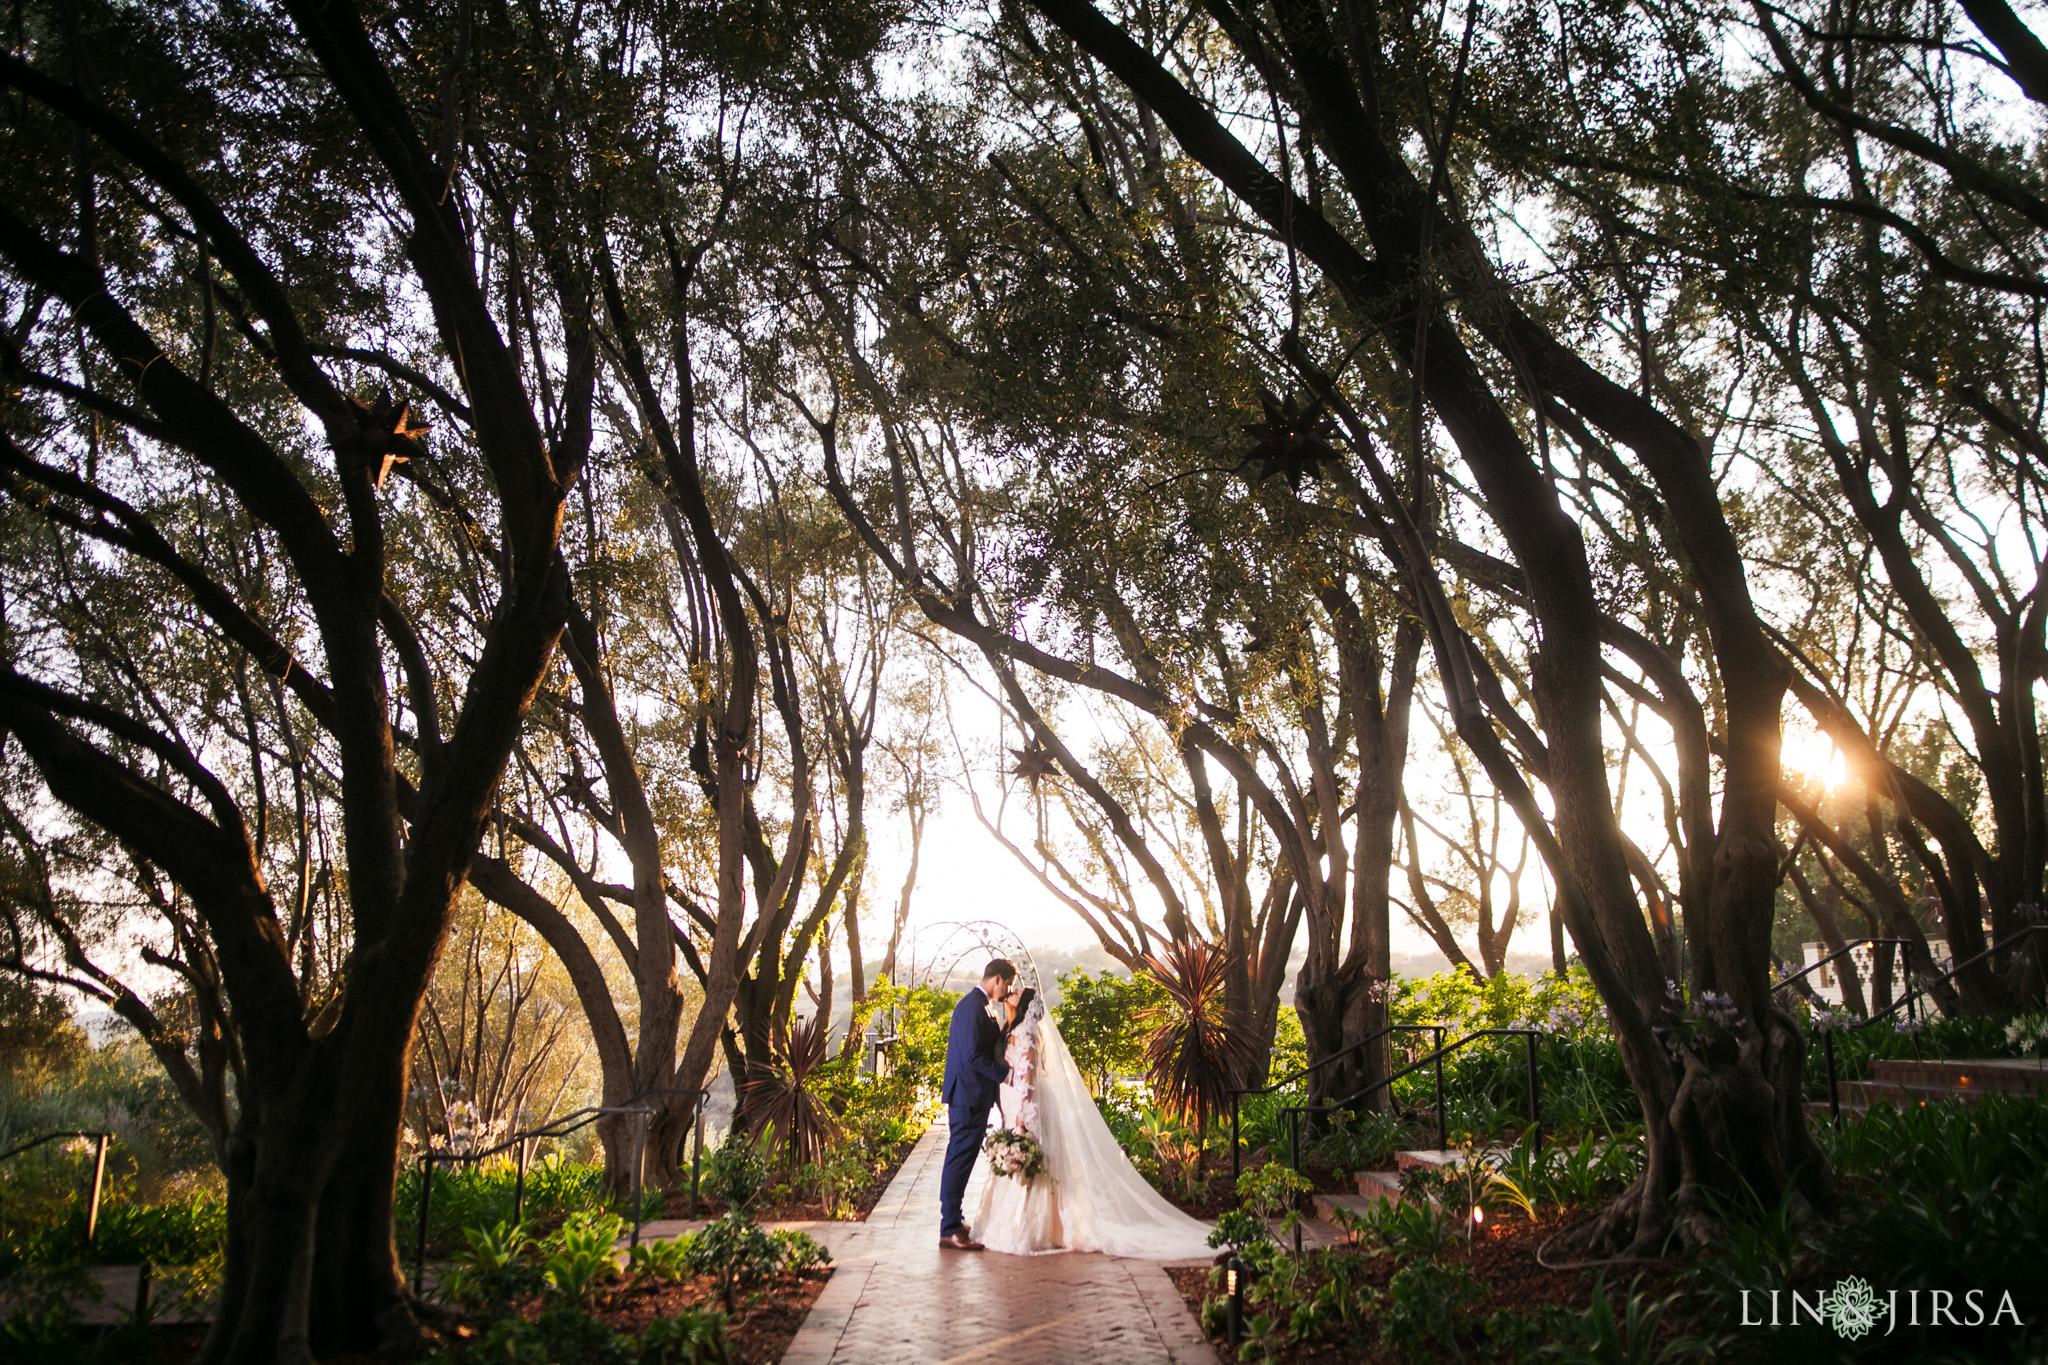 020 padua hills claremont wedding photography